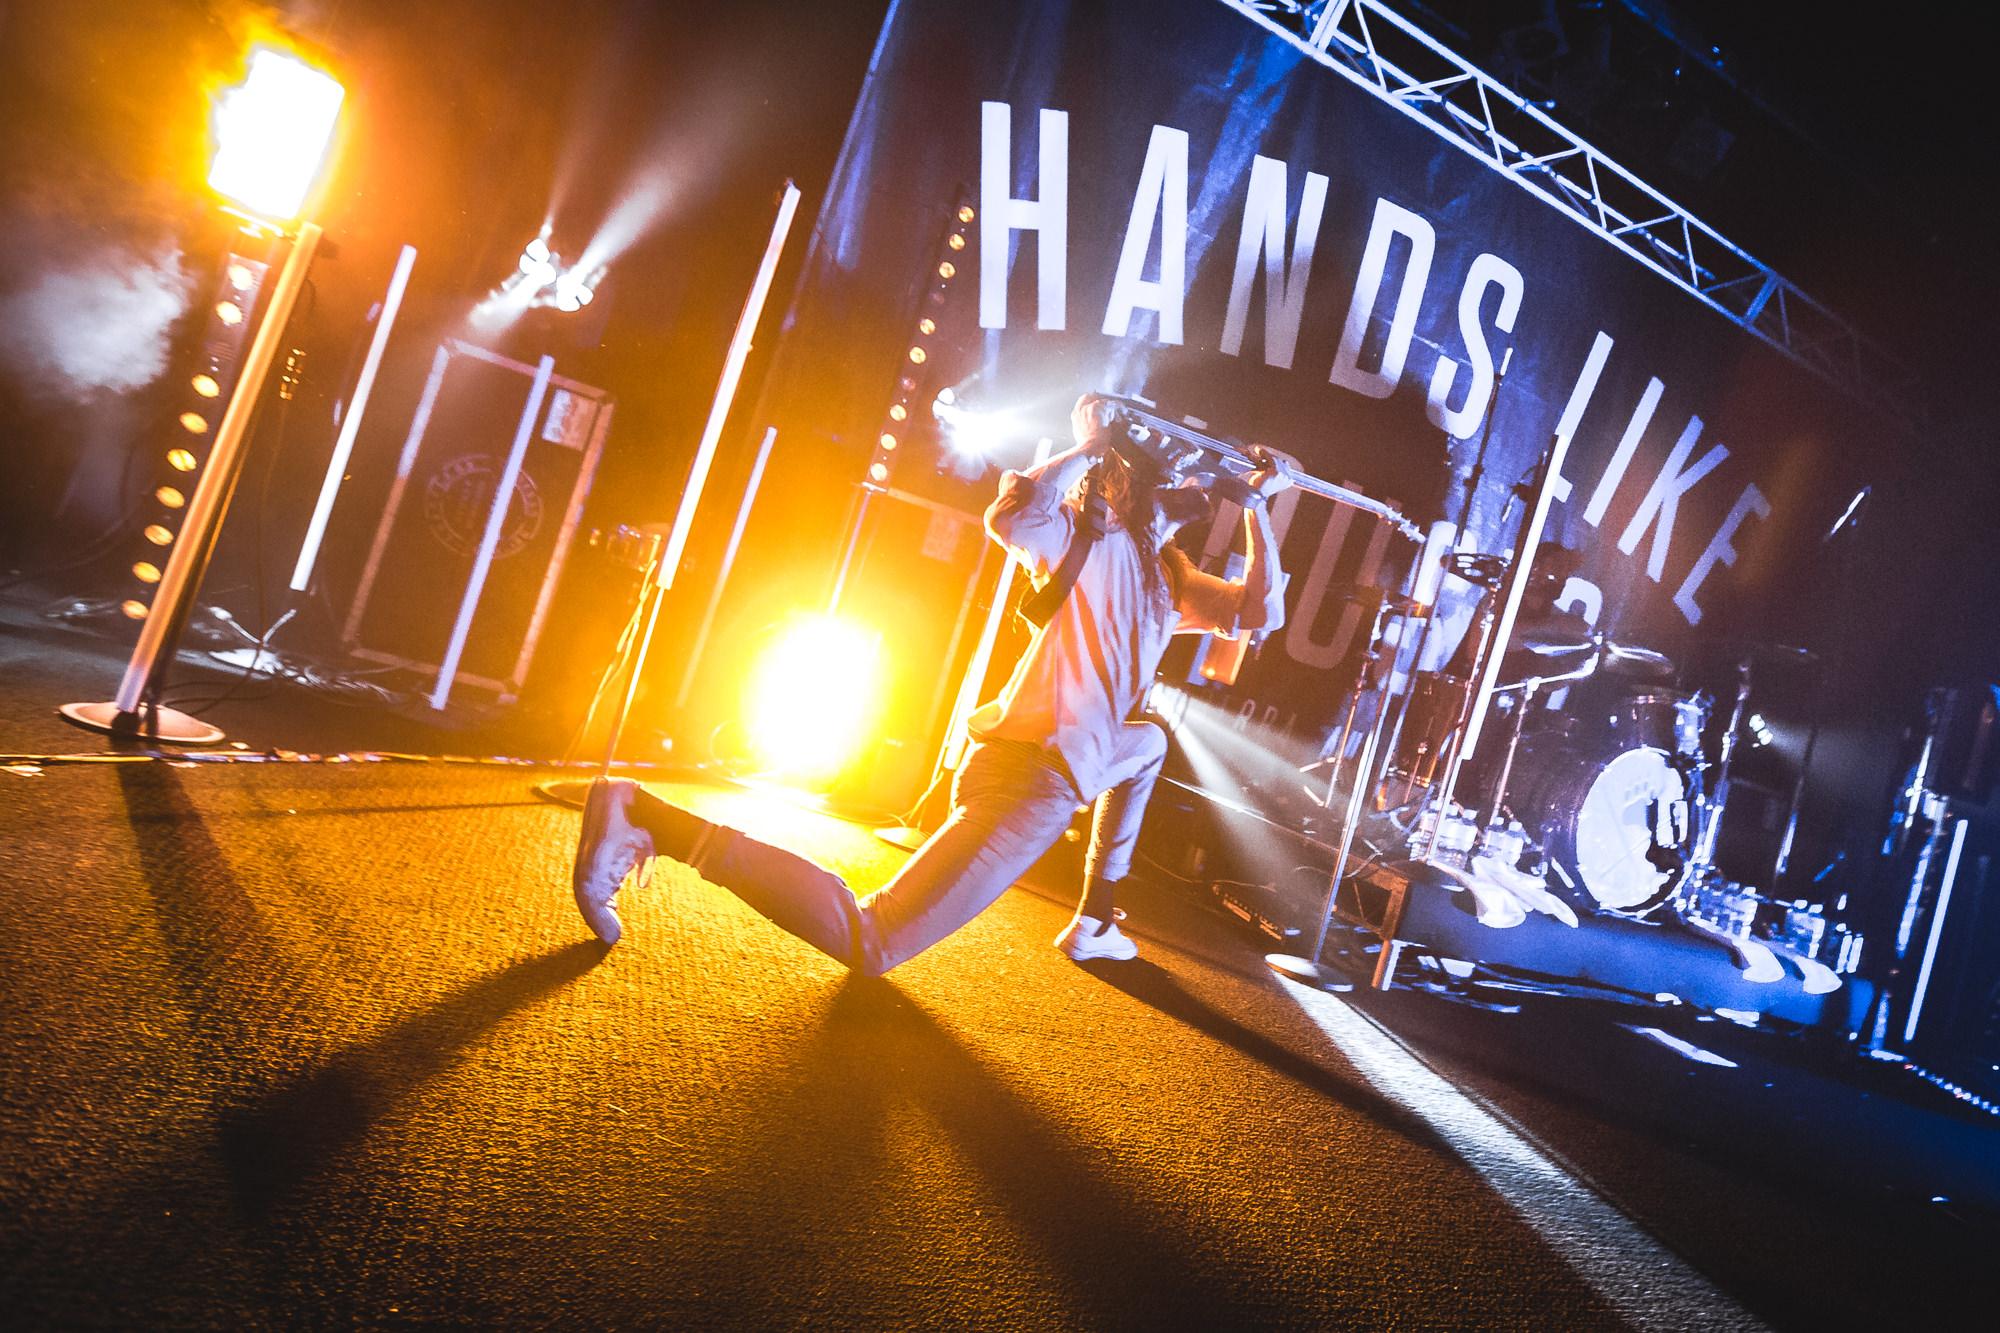 hands-like-houses-festival-concert-event-music-photography.jpg